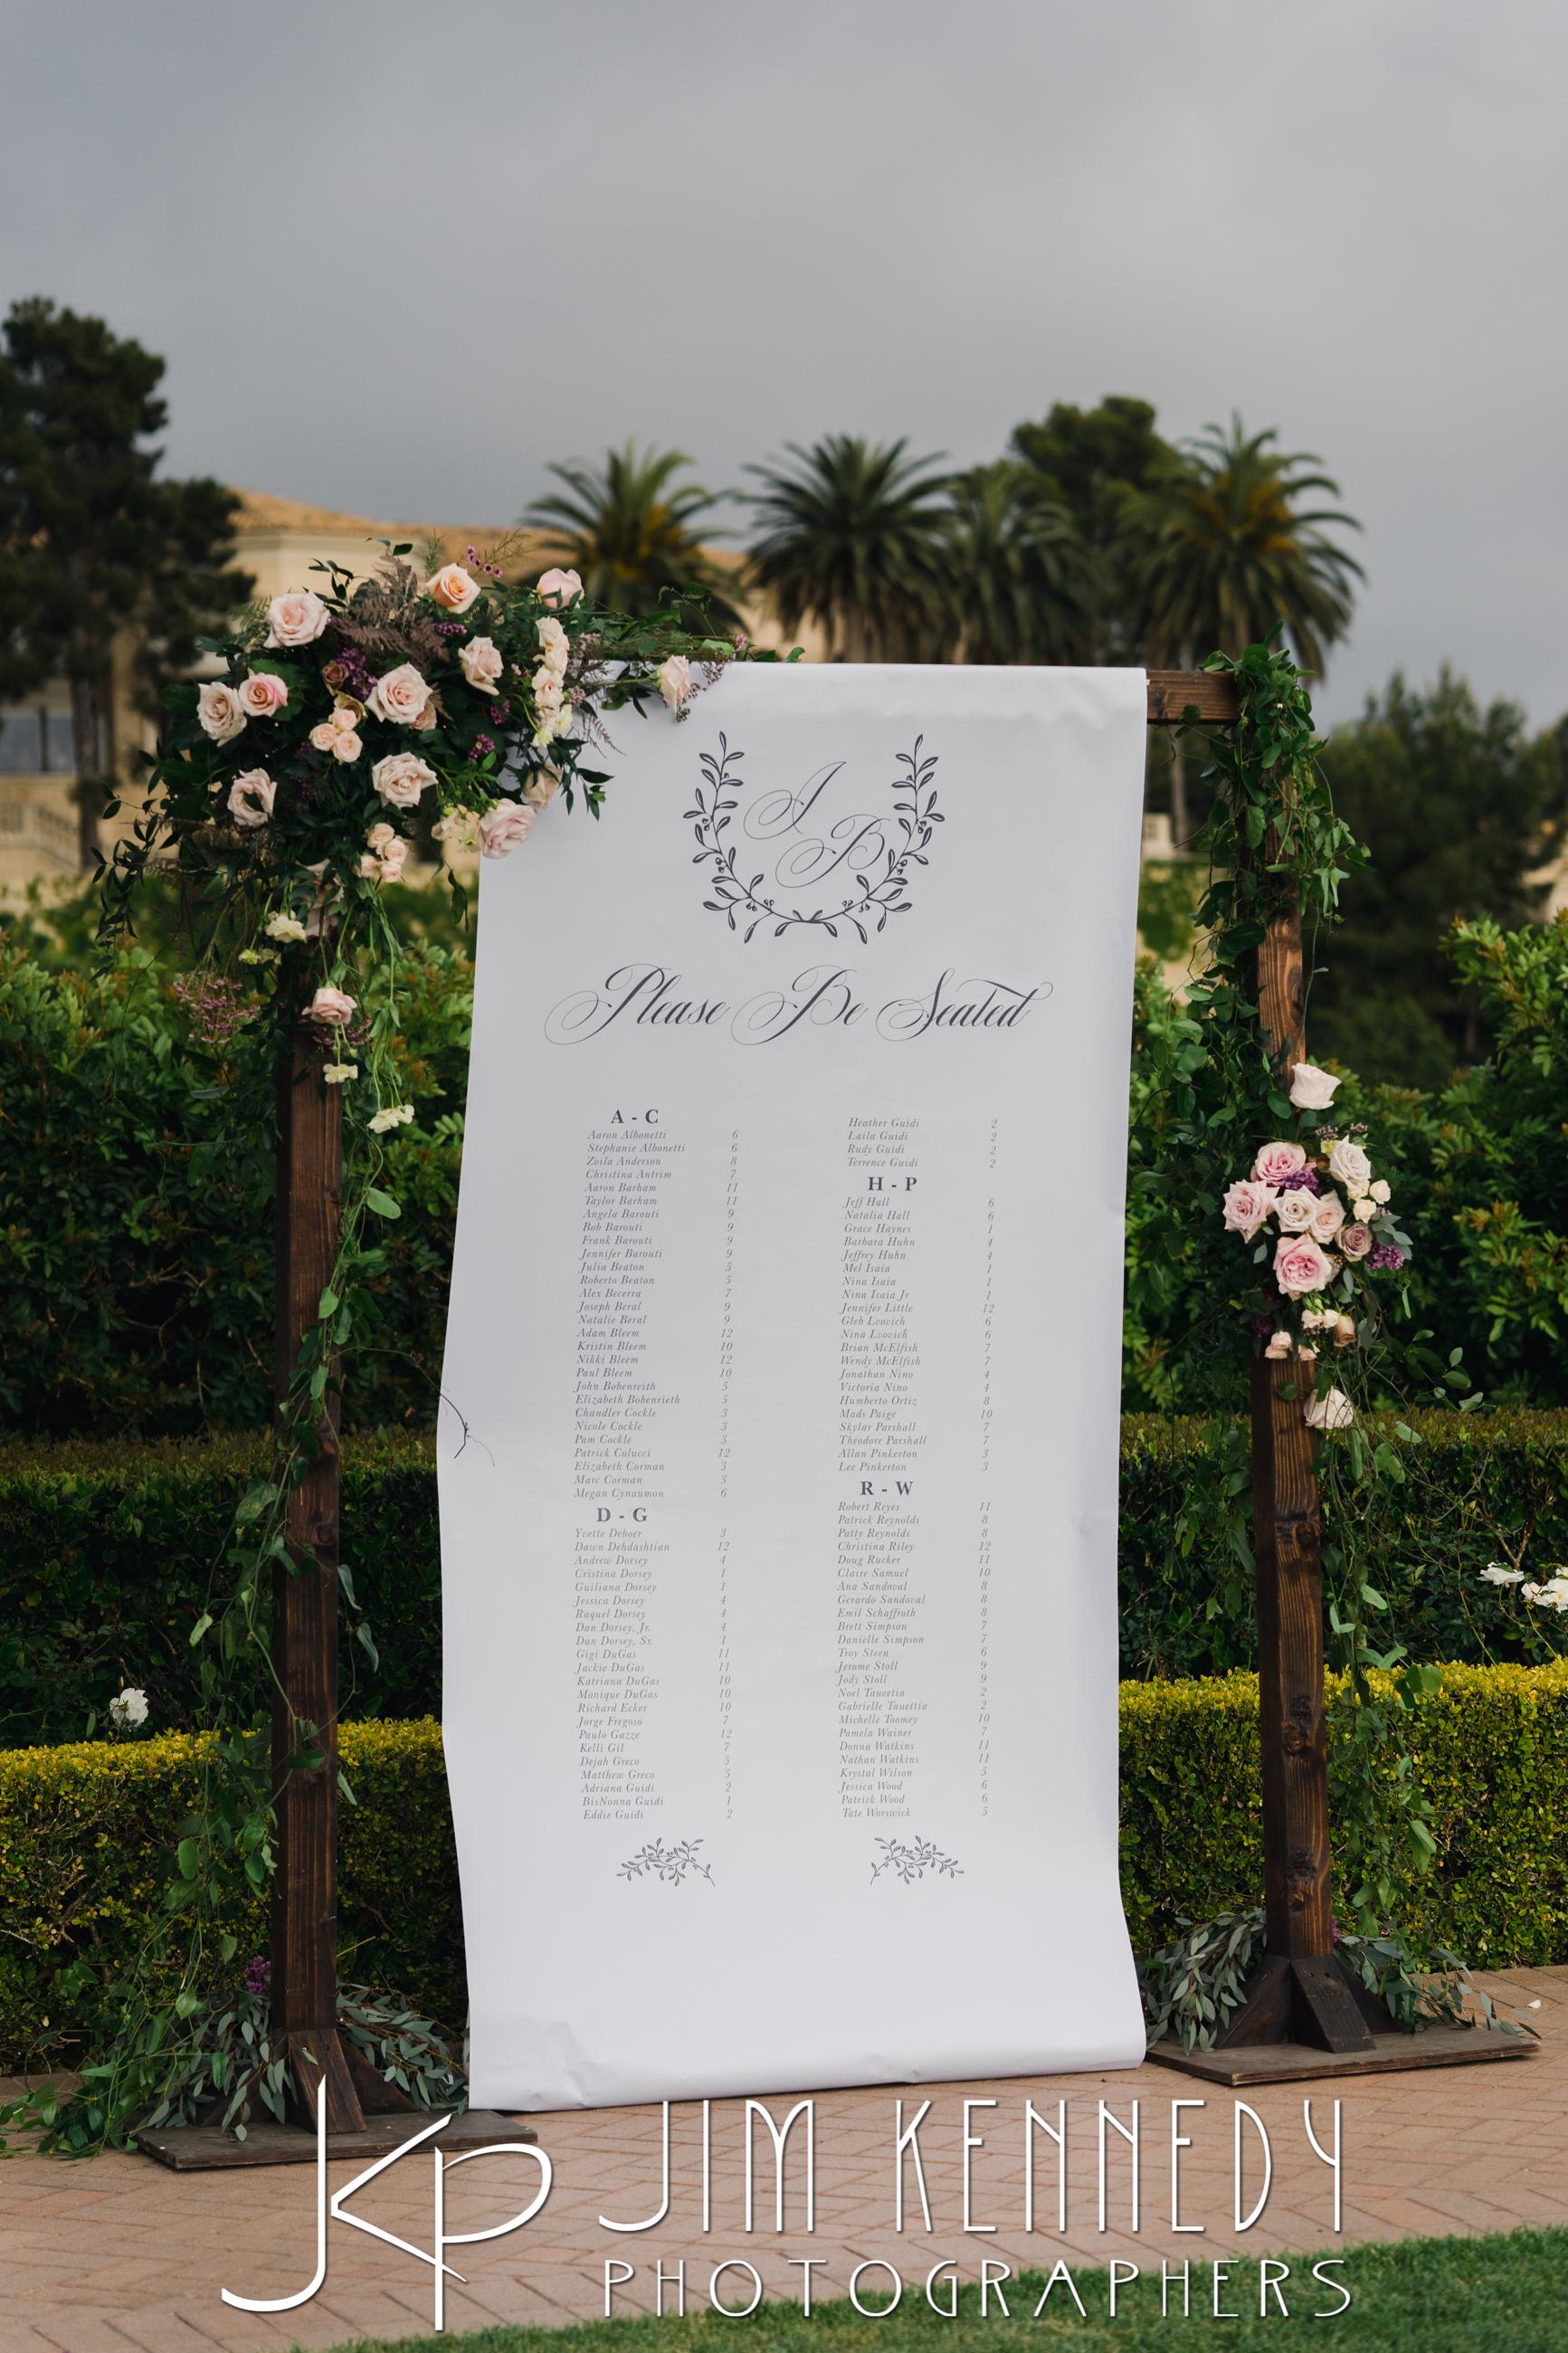 pelican-hill-wedding-jim-kenedy-photographers_0181.JPG